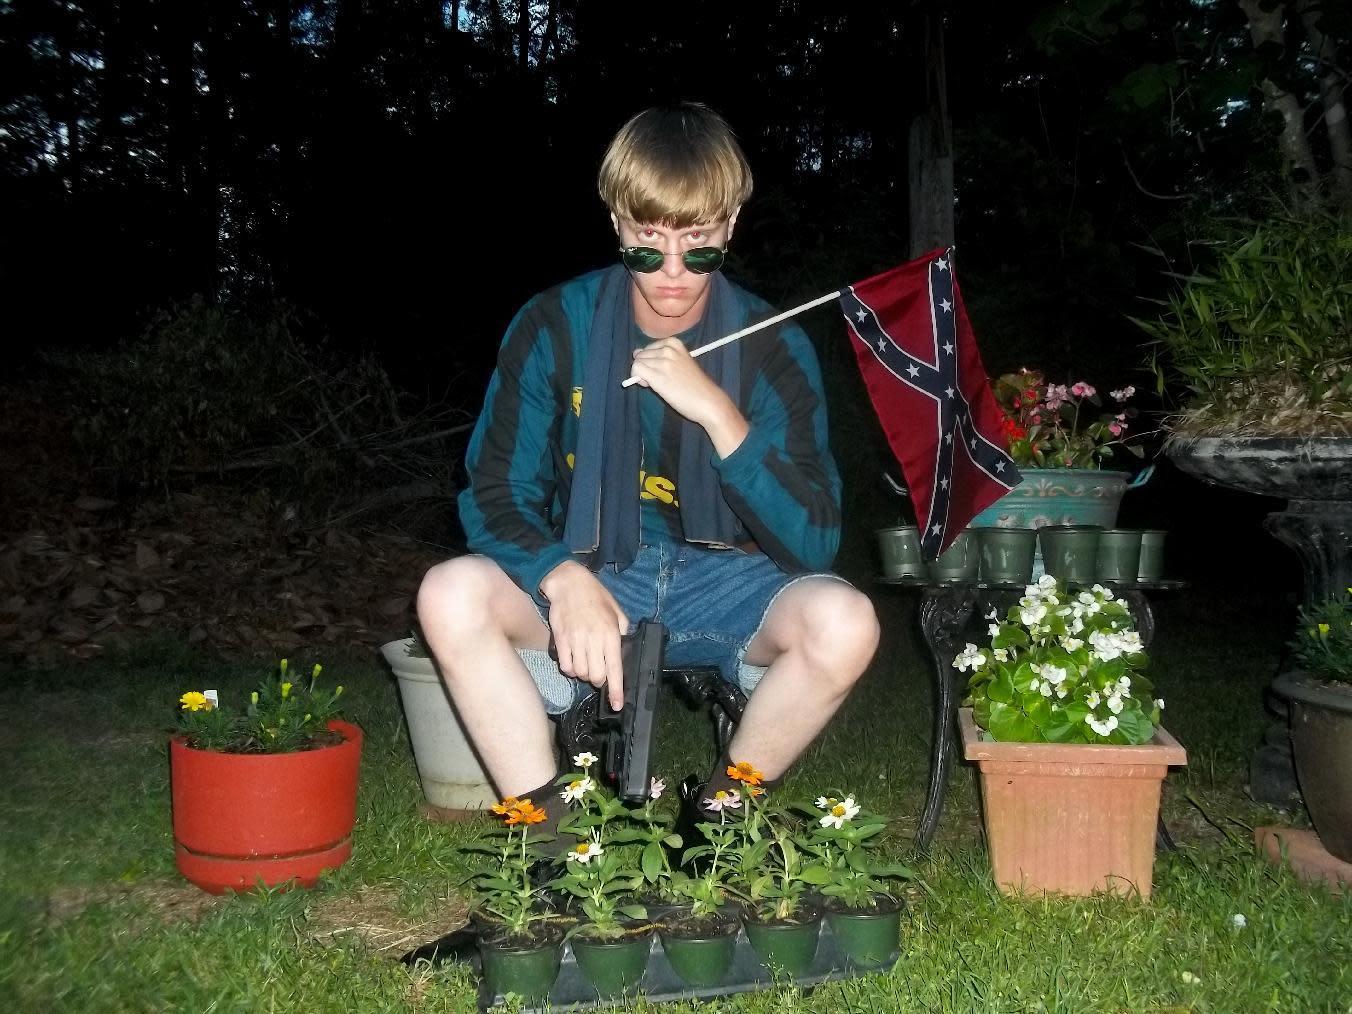 FBI: Dylann Roof got gun because of screening-system failures